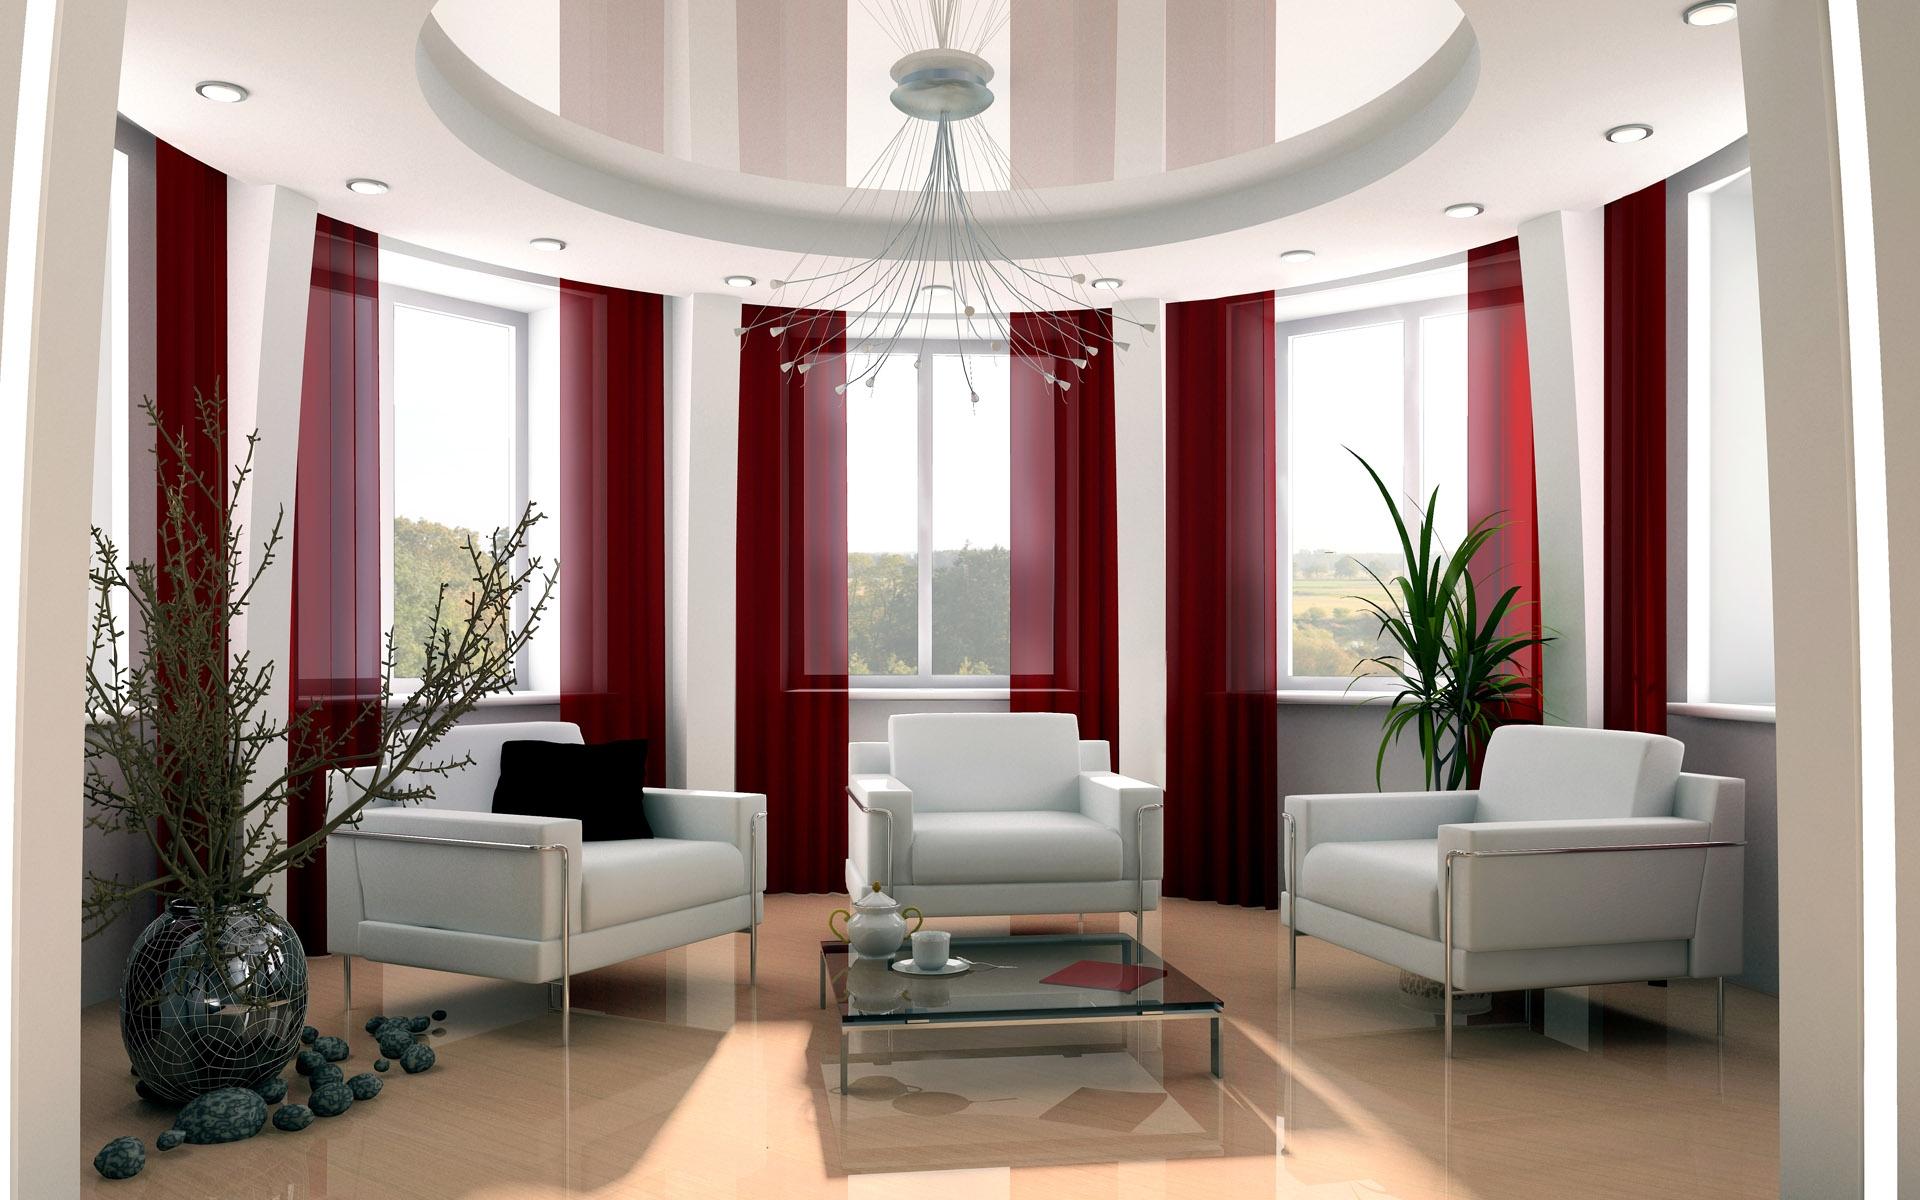 Living Room Room Chairs Window Style